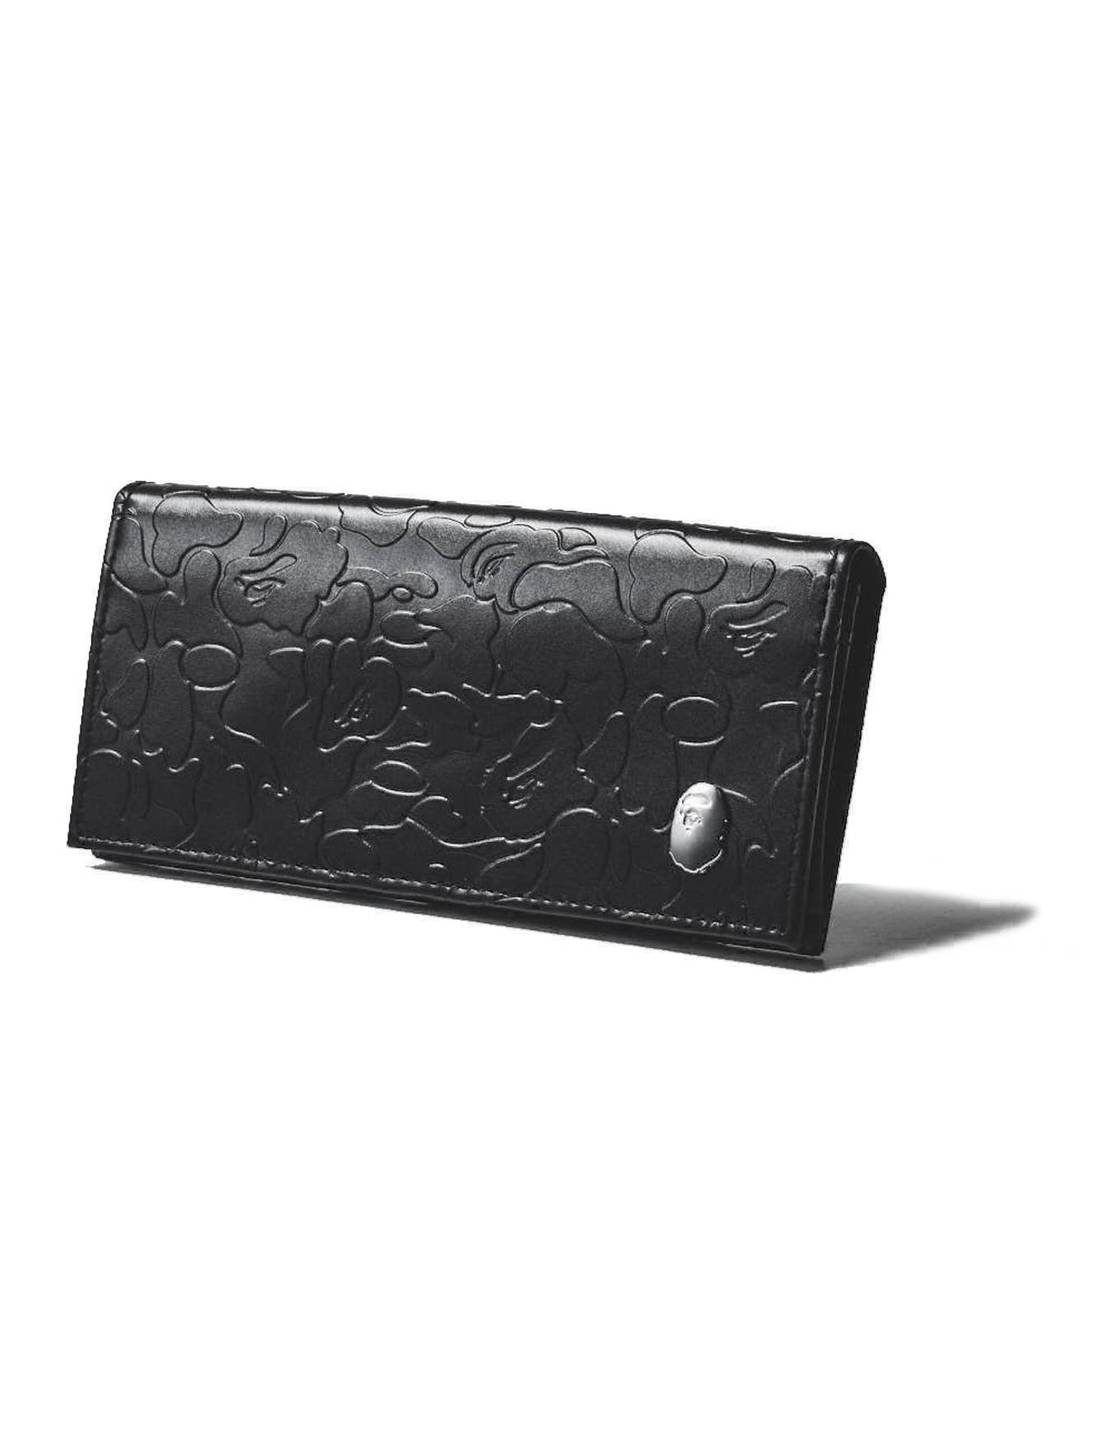 Bape Bape Wallet Embossed Camo Silver Logo Black Vegan Leather A Bathing Ape Size One